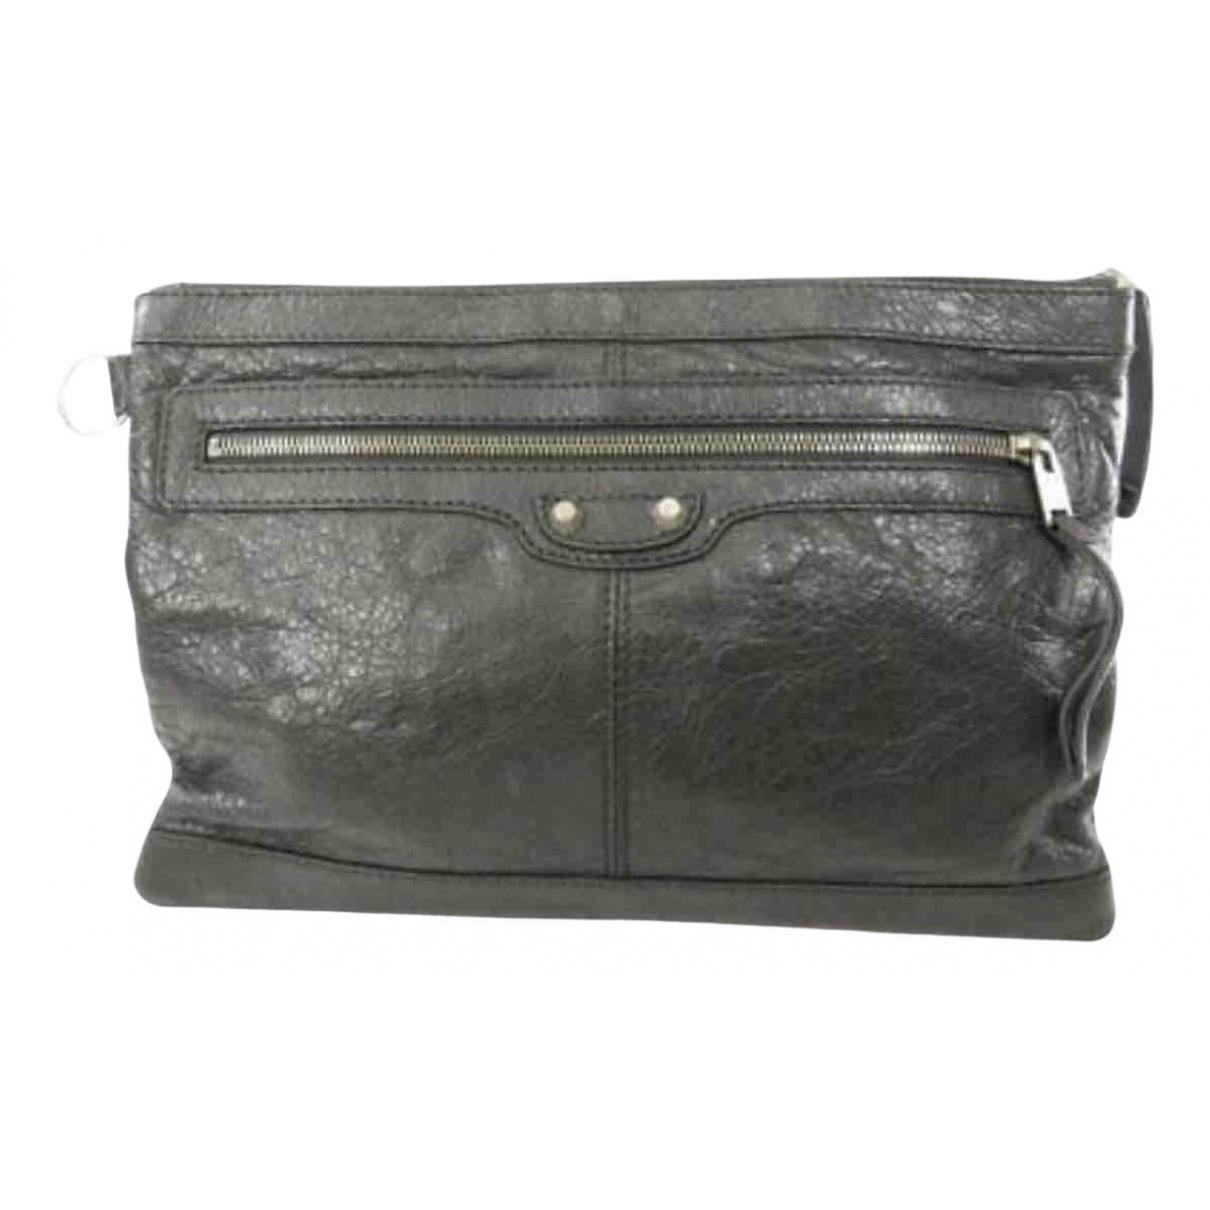 Balenciaga N Grey Leather Small bag, wallet & cases for Men N